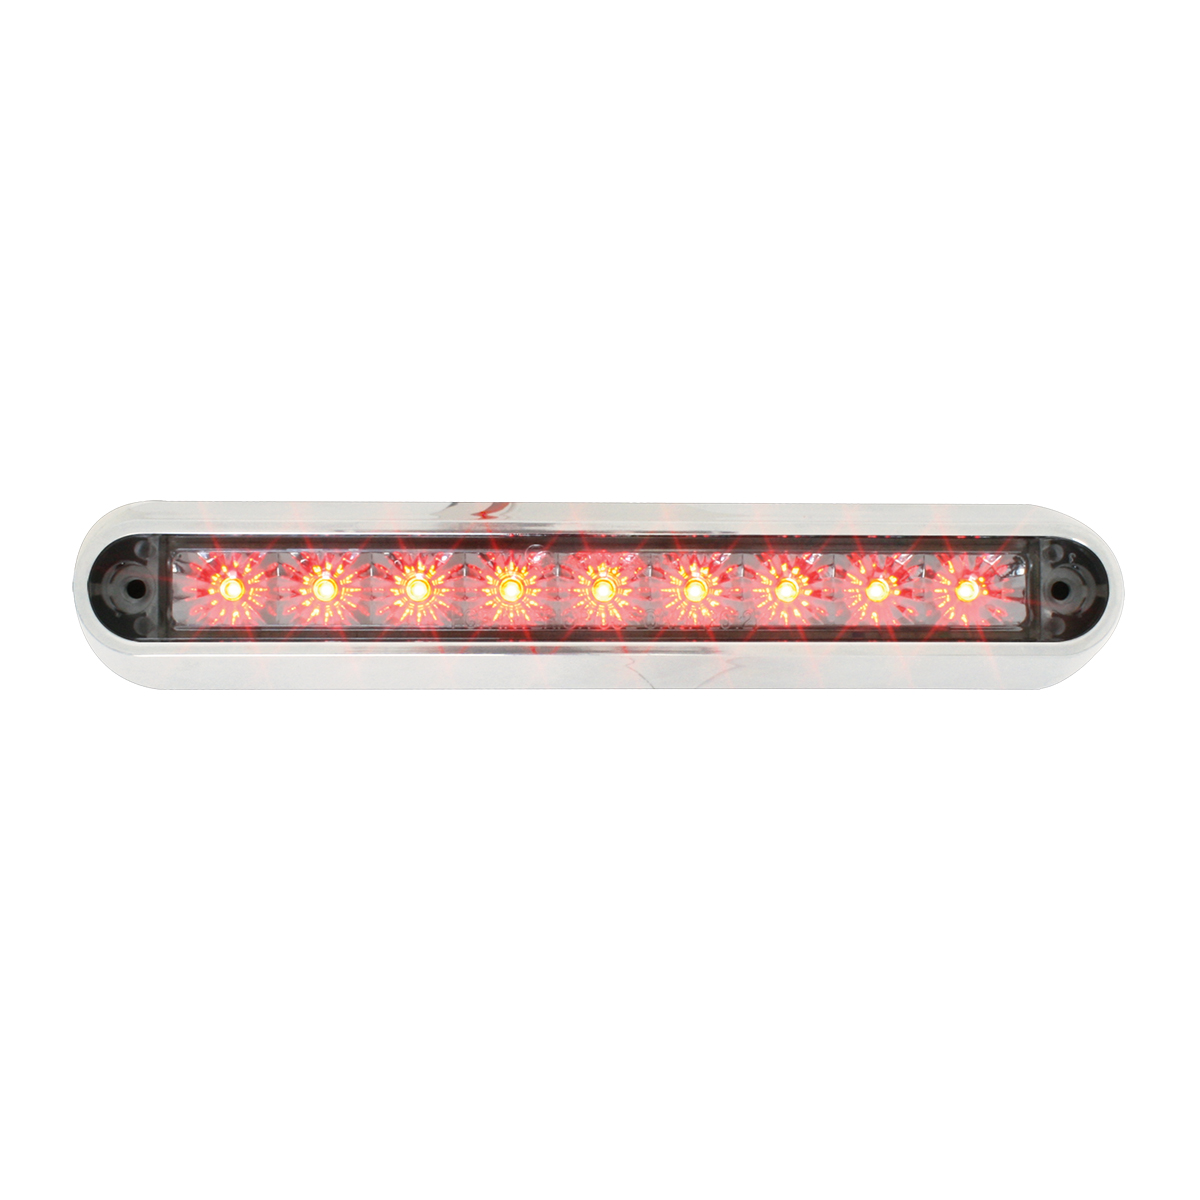 "76093 6.5"" Surface Mount LED Light Bar w/ Chrome Plastic Base"